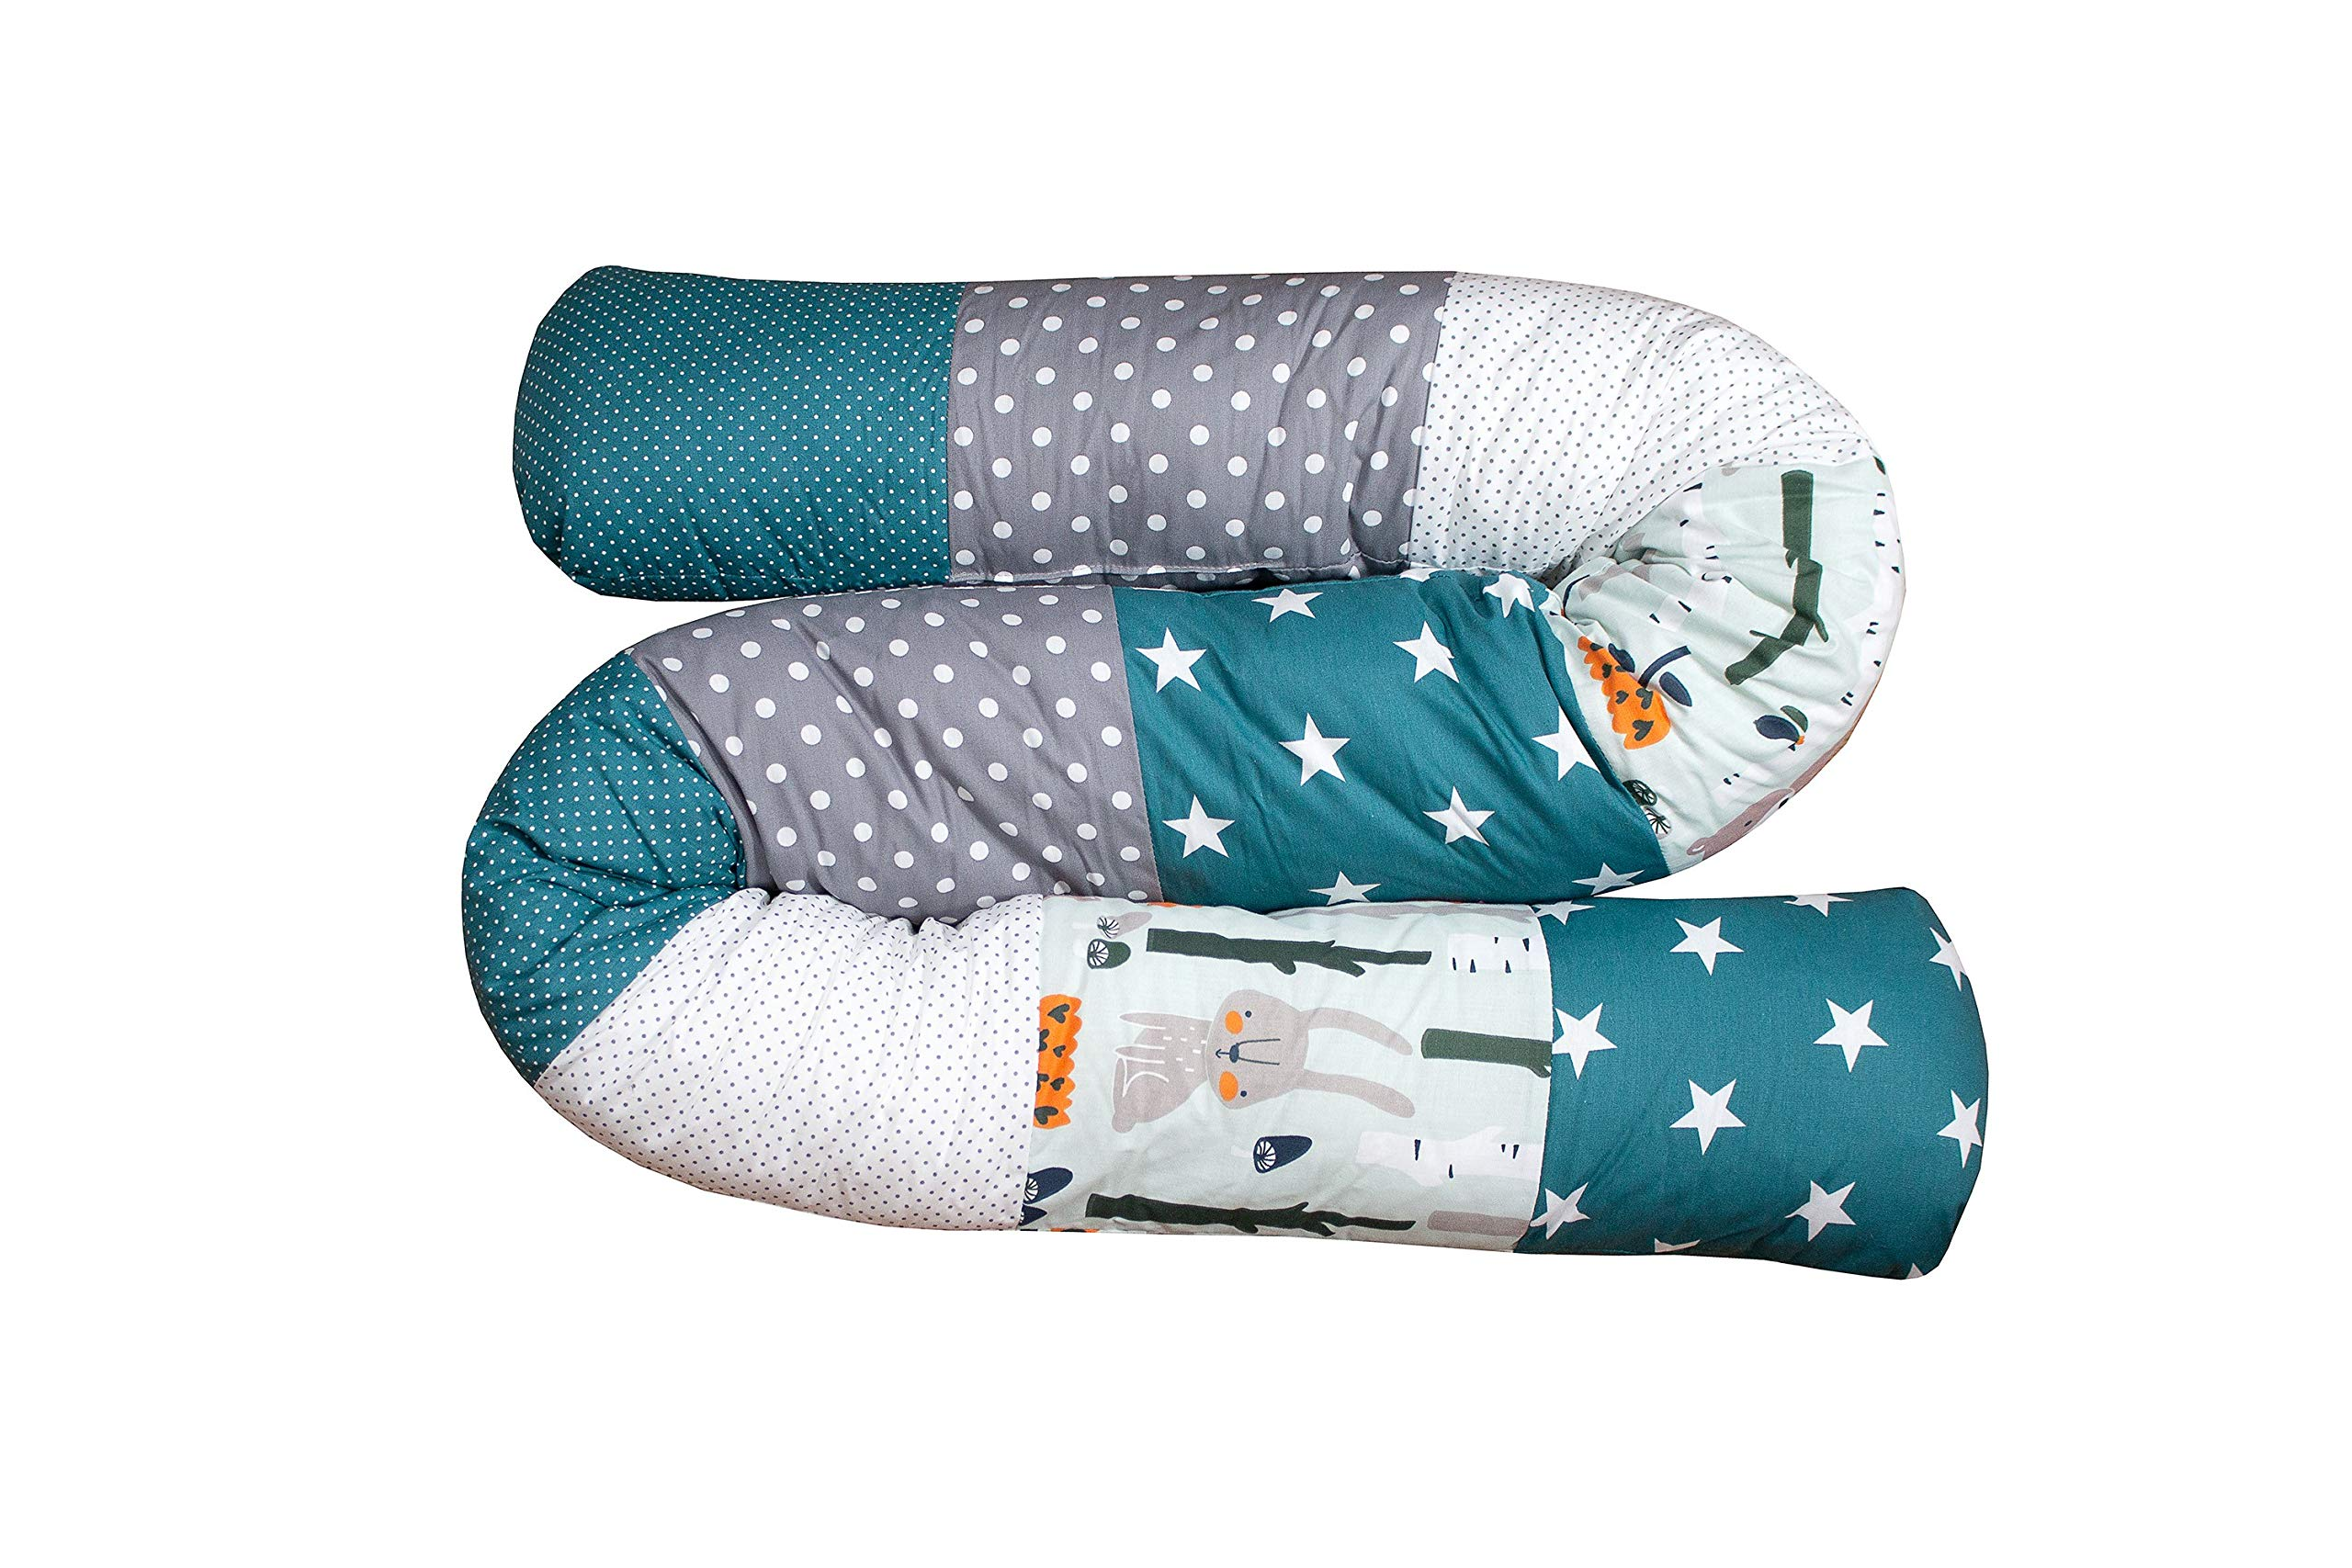 "Snake Pillow Bumper by ULLENBOOM | Woodland/Stars/Polka Dots | Toddler Bed/Cot | 79"" Long - Unisex Teal/Grey"